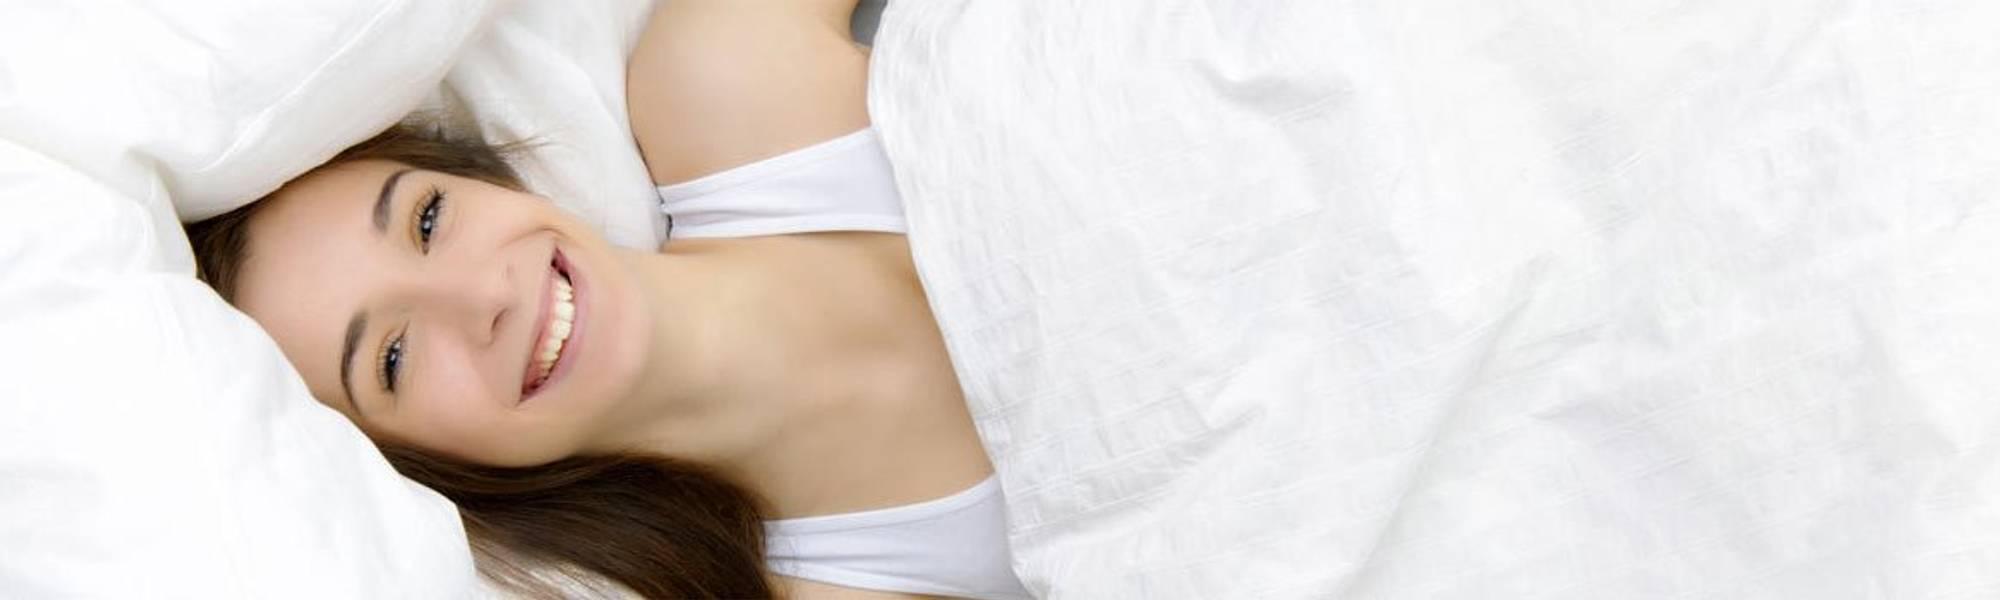 la roche posay article living sensitive skin woman in bed